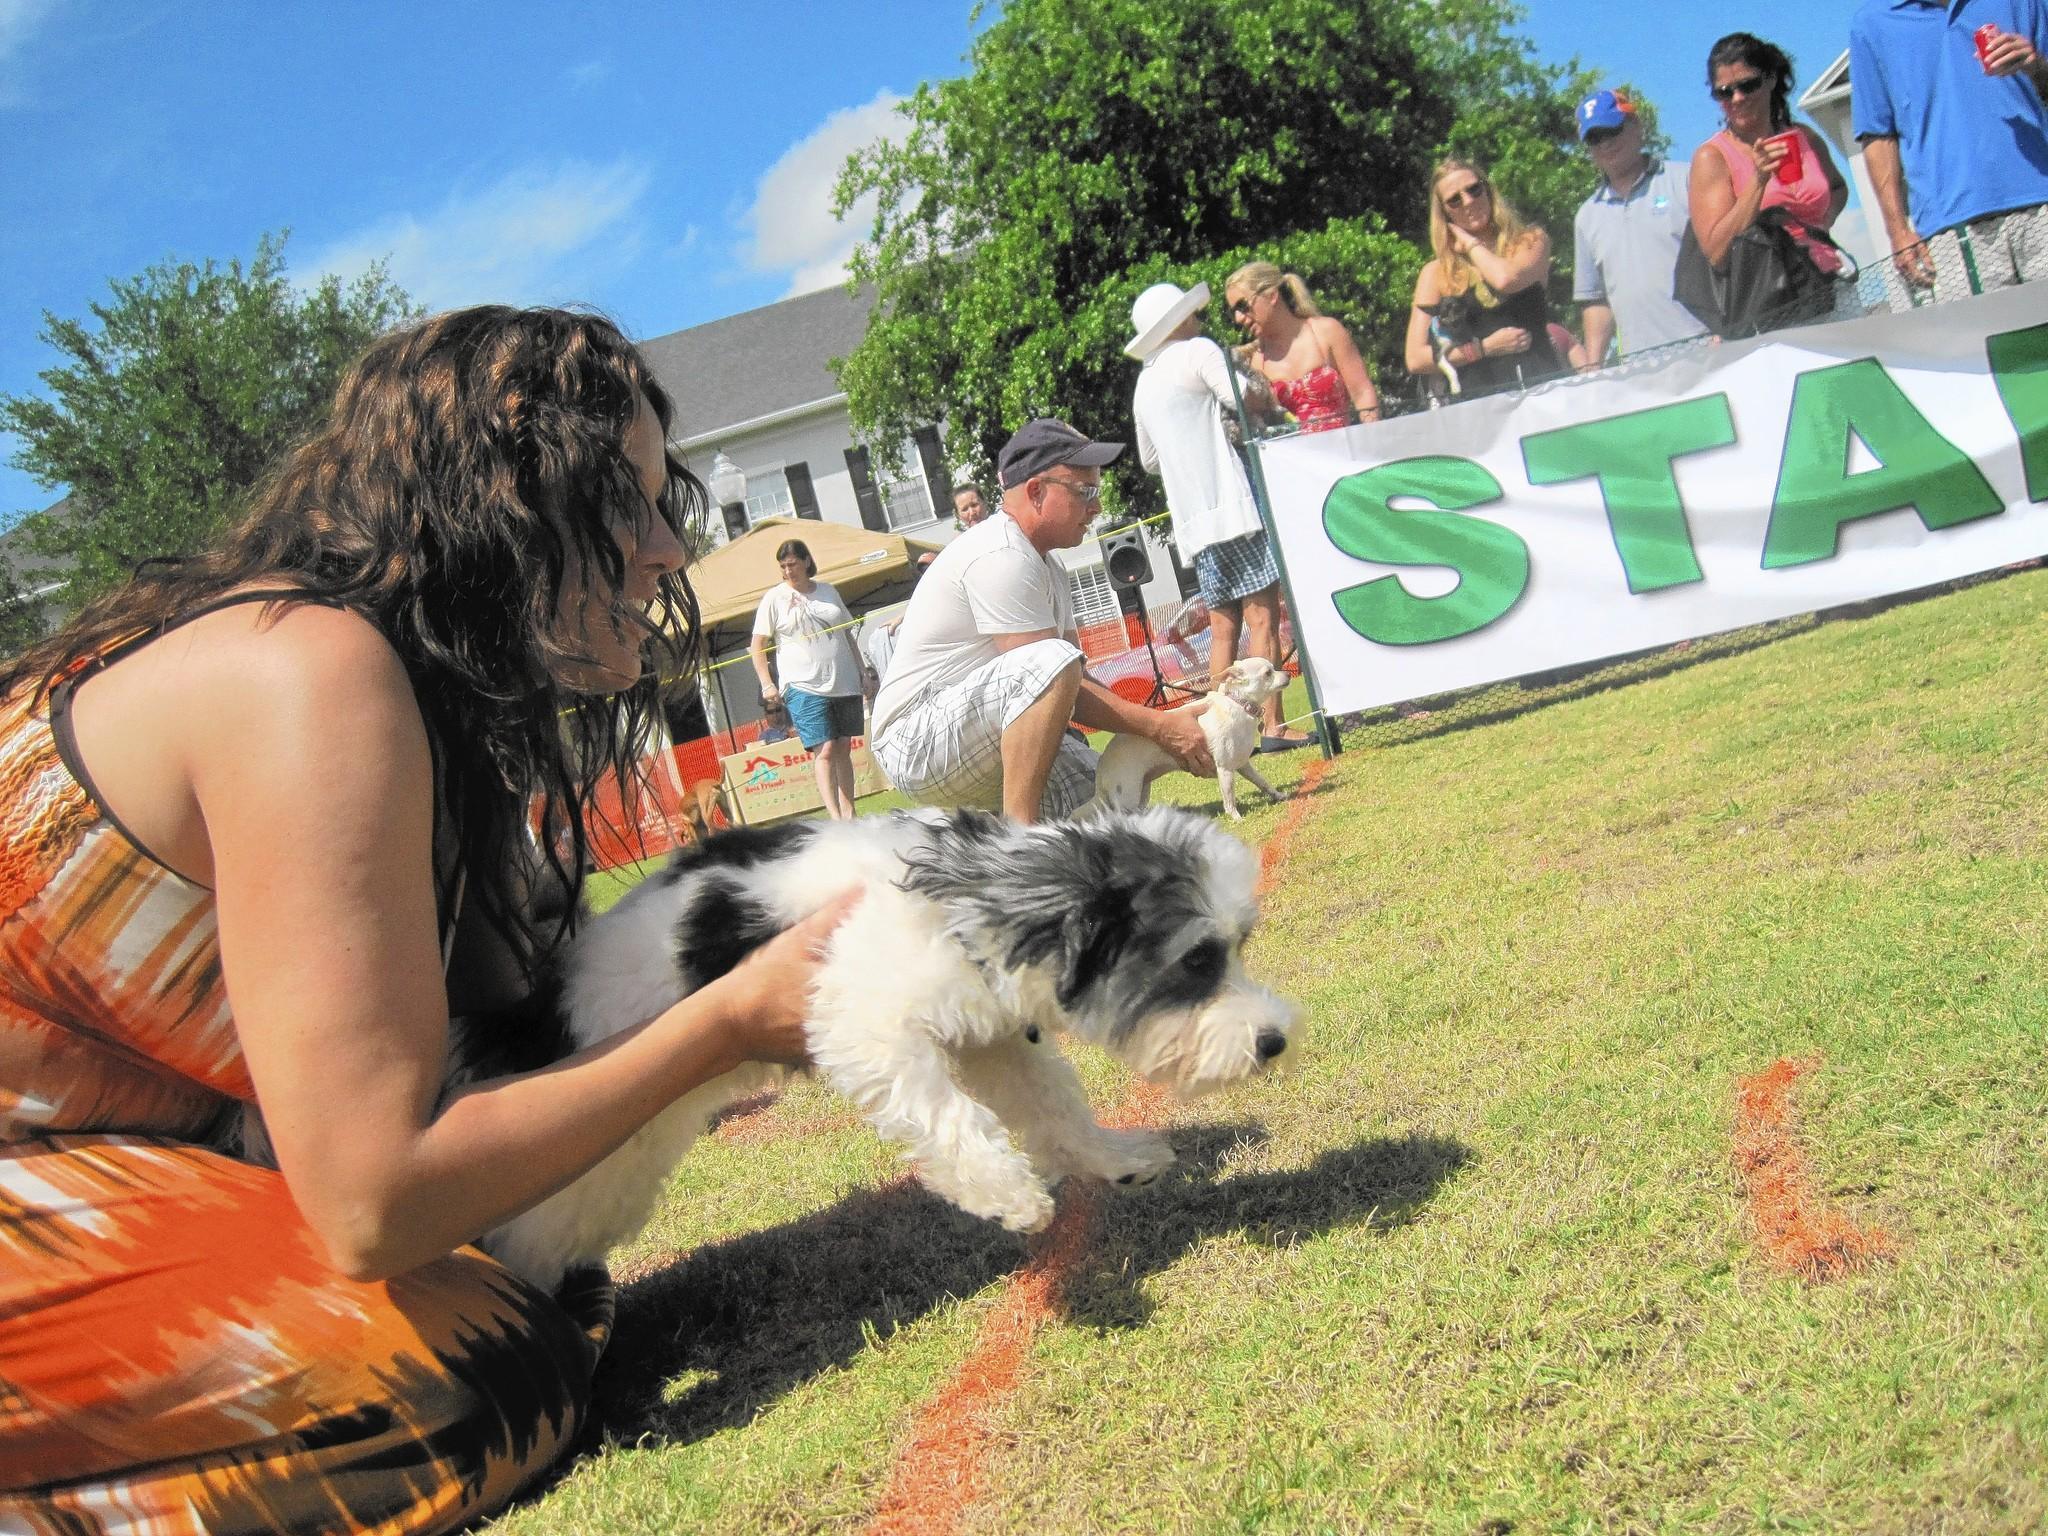 The Doggie Derby is Saturday, March 8 at Baldwin Park in Orlando.